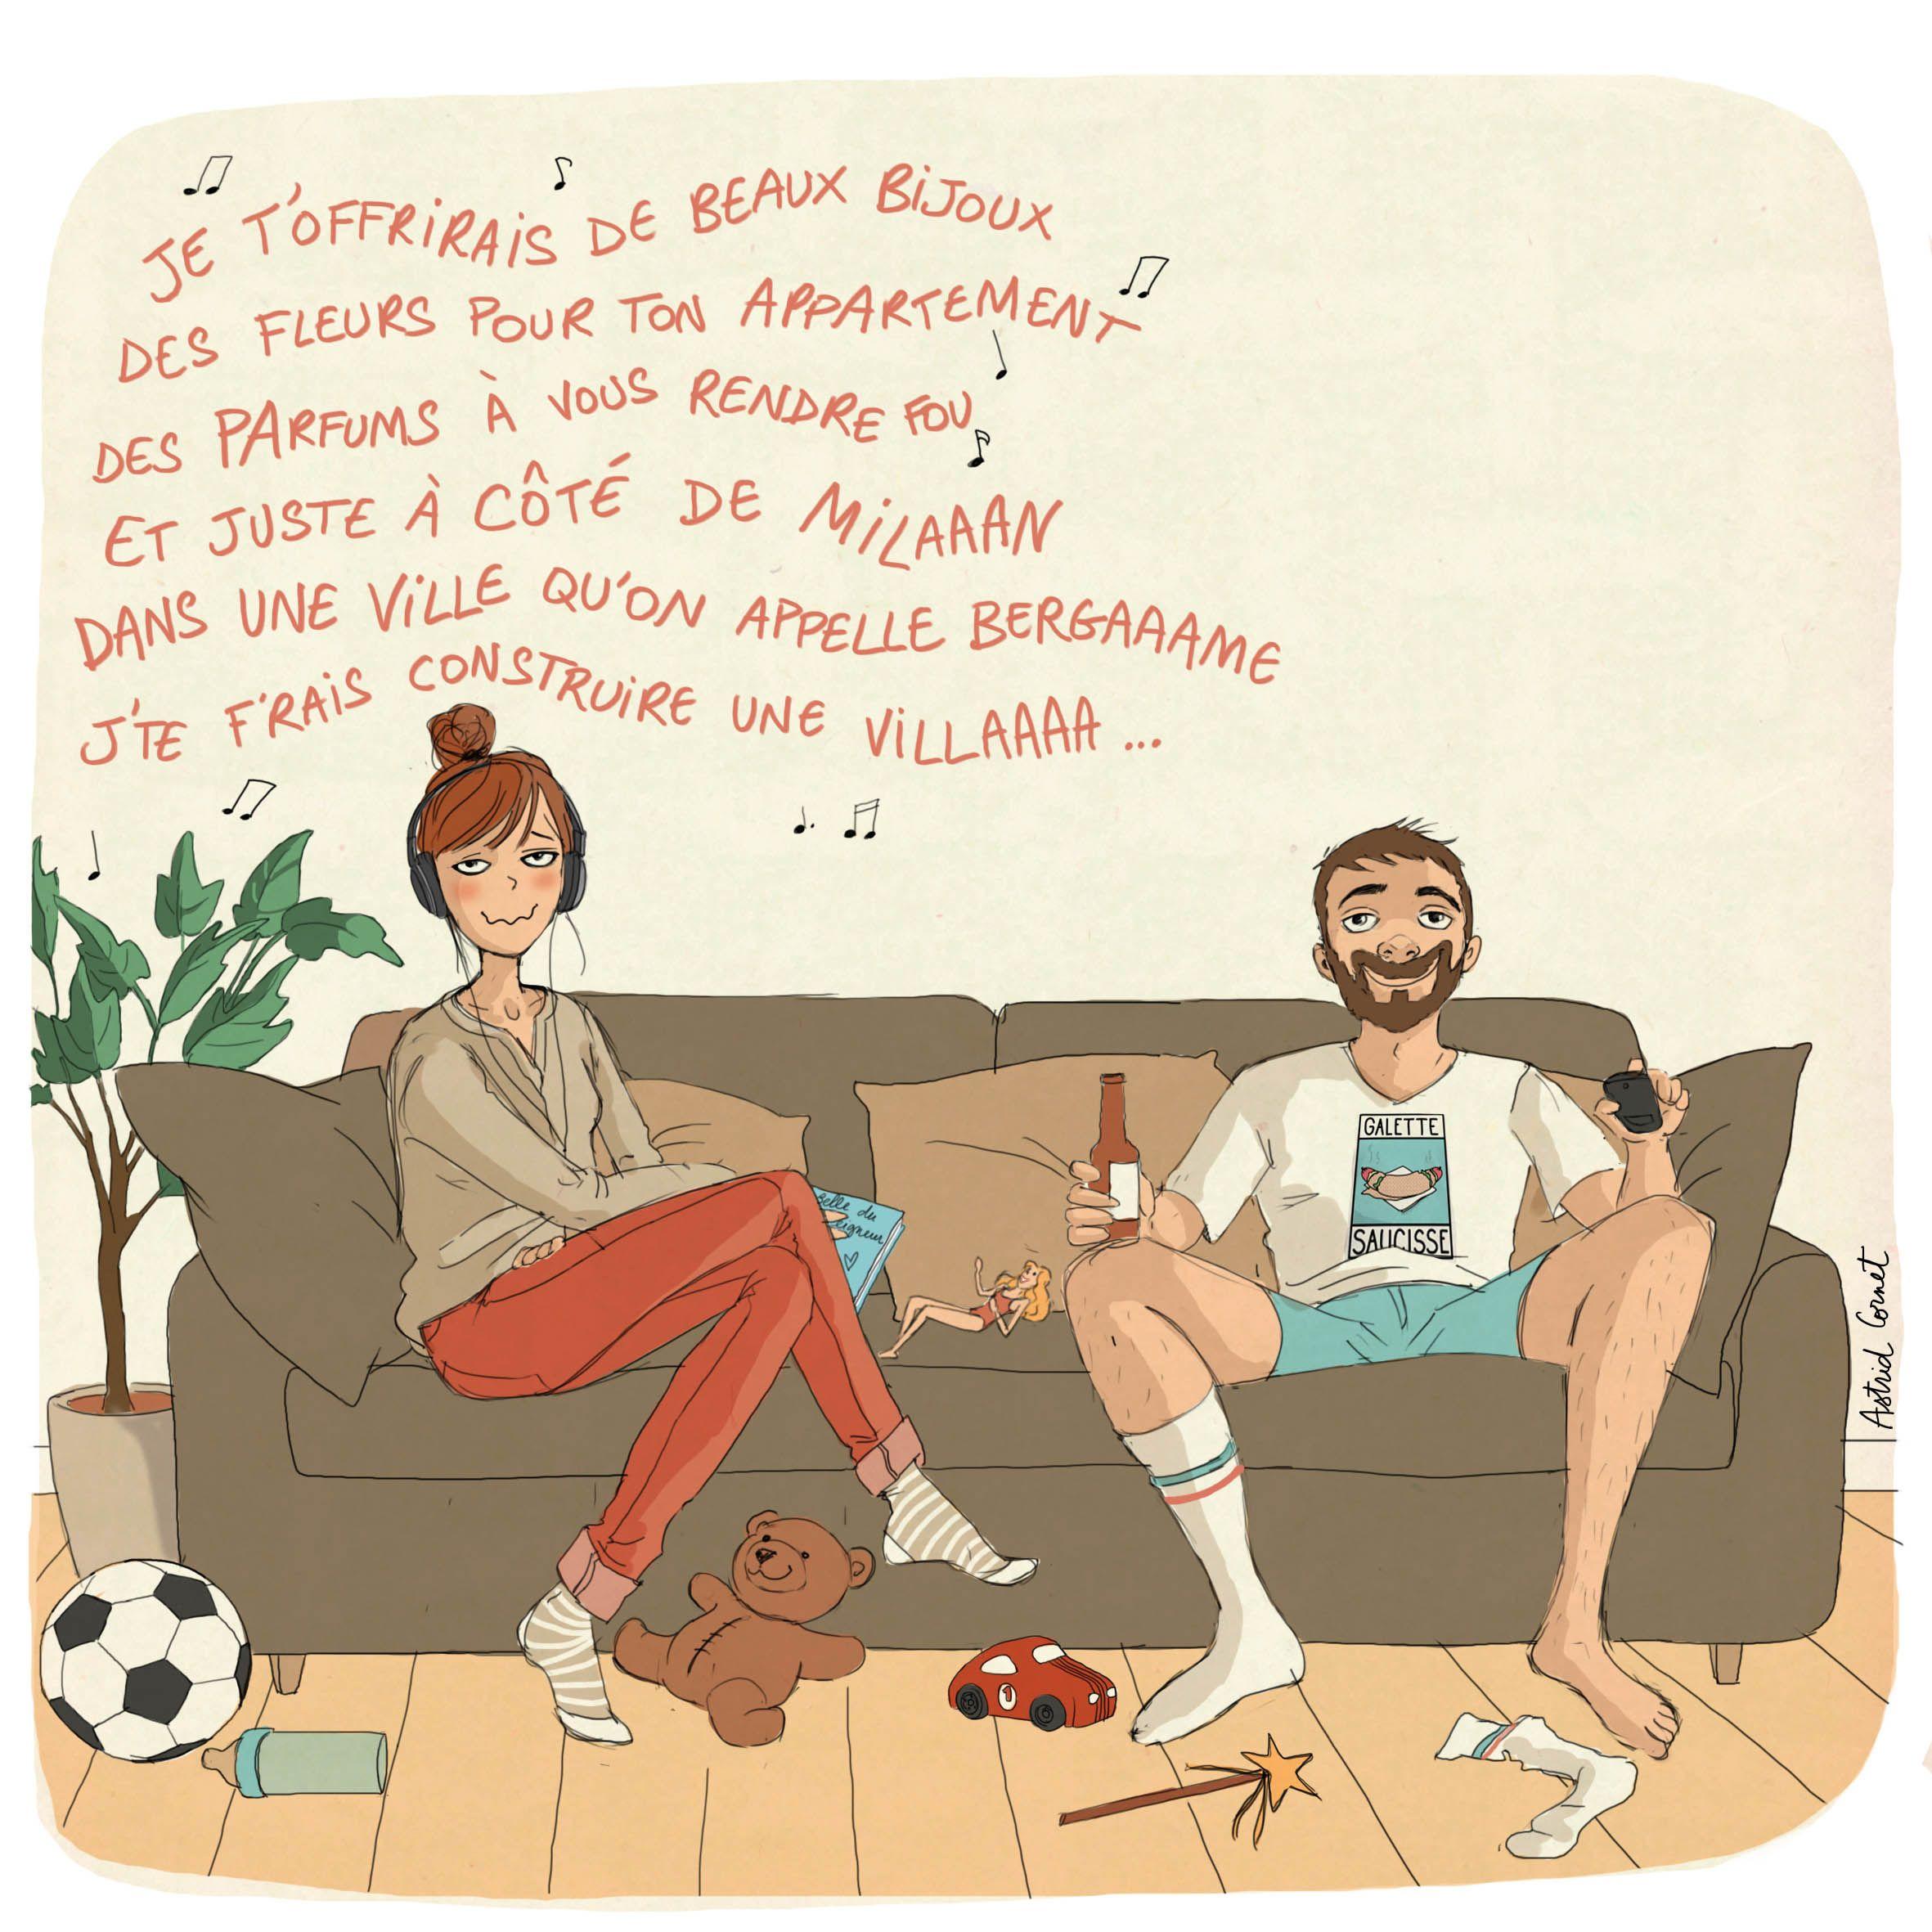 Illustration Illustratrice Humour Dessindhumeur Dessindhumour Moisijetaisunhomme Romantique Marsetvenus Unesoiree Dessin Humour Impressionnisme Humour